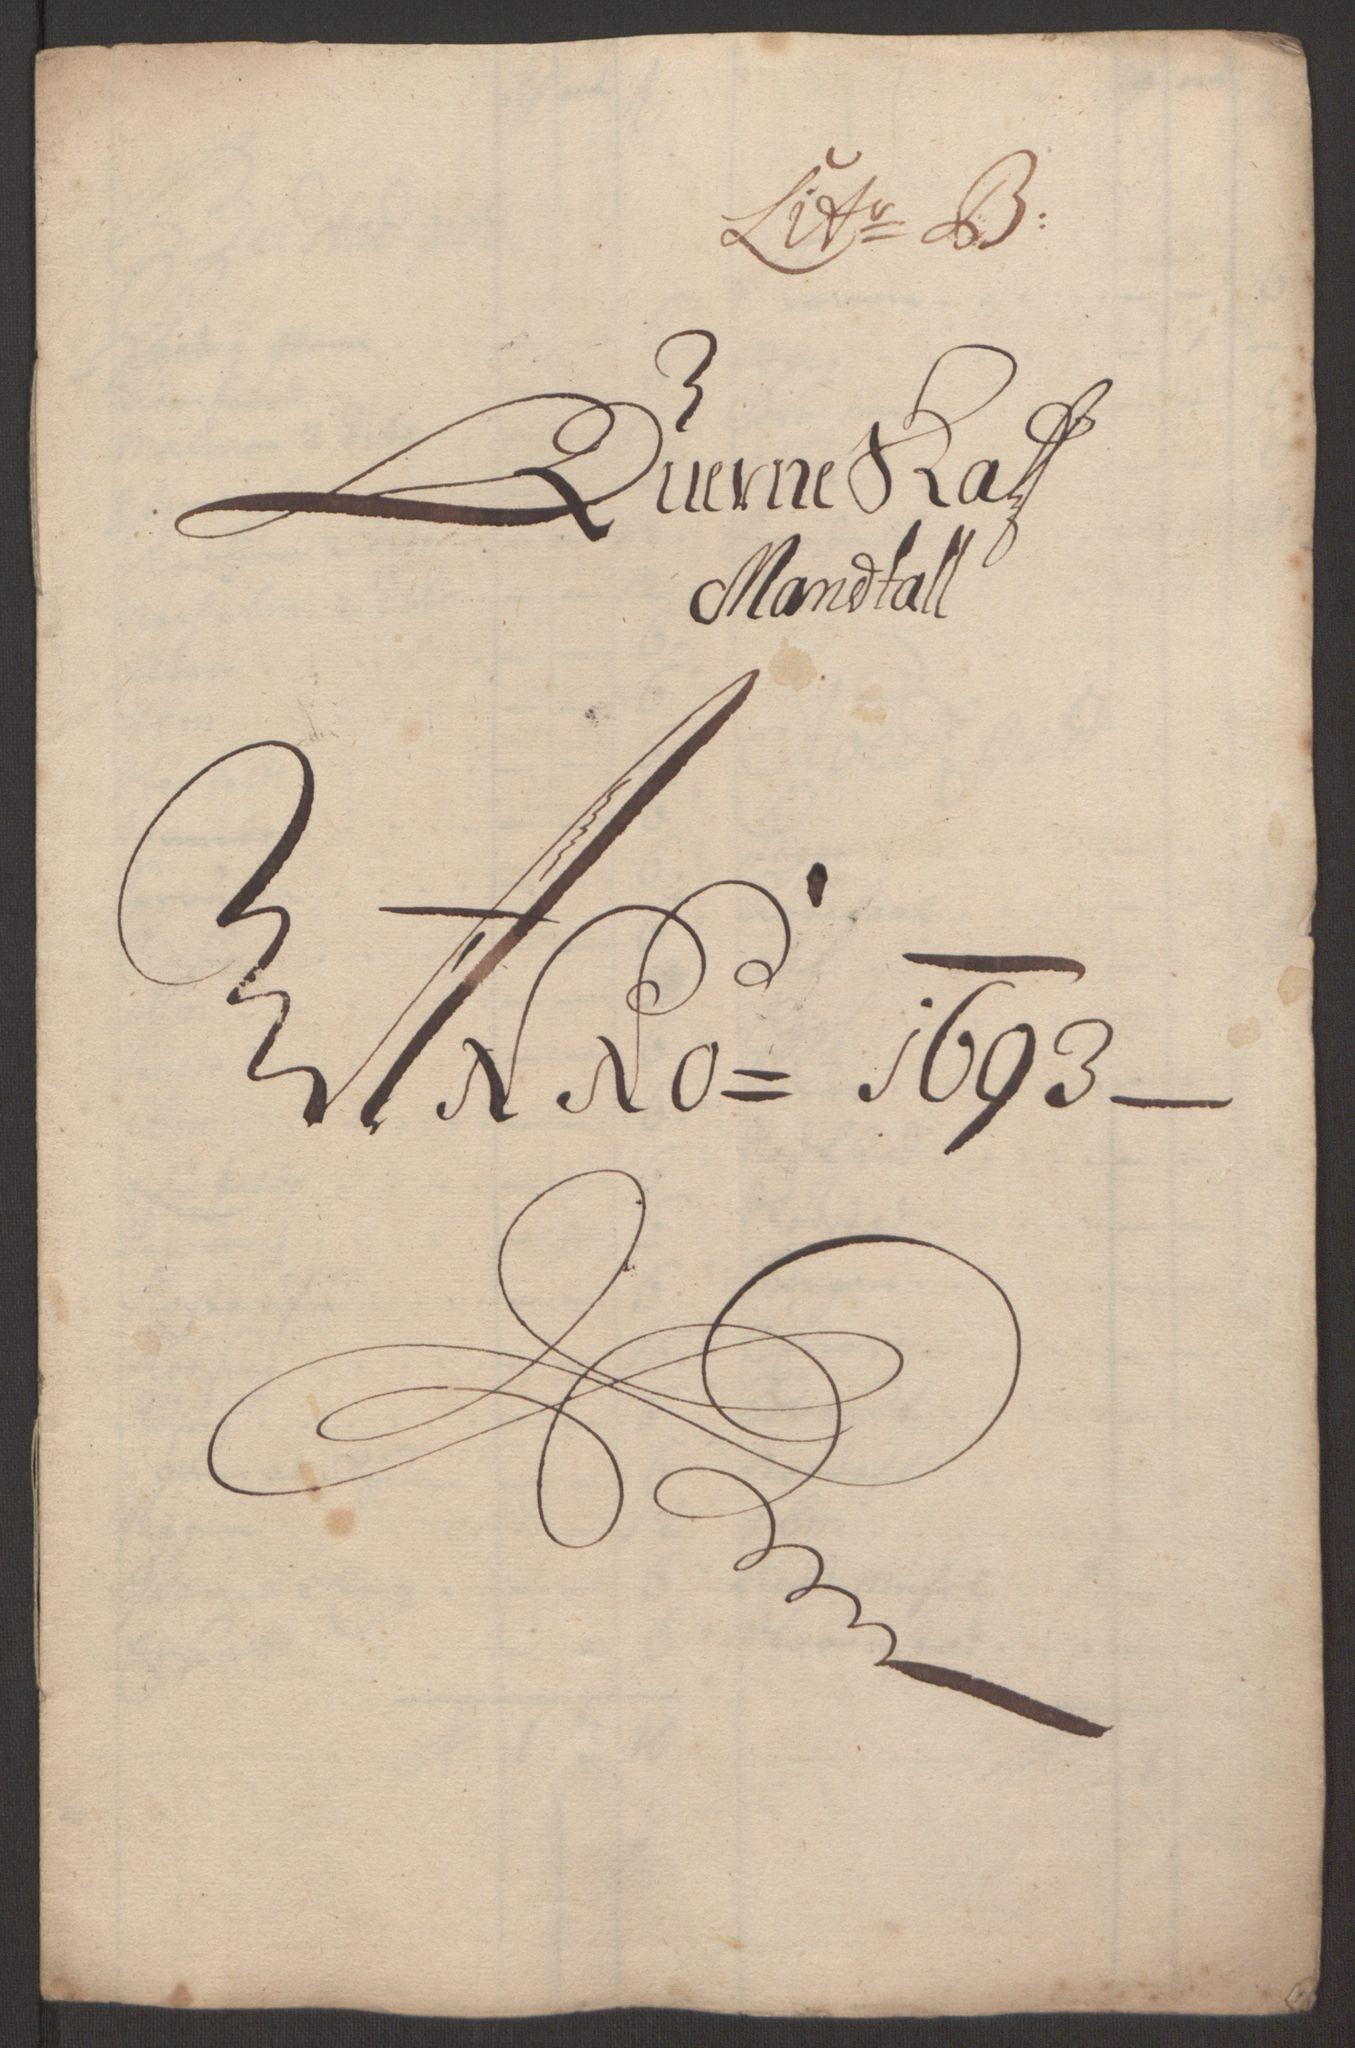 RA, Rentekammeret inntil 1814, Reviderte regnskaper, Fogderegnskap, R63/L4308: Fogderegnskap Inderøy, 1692-1694, s. 426